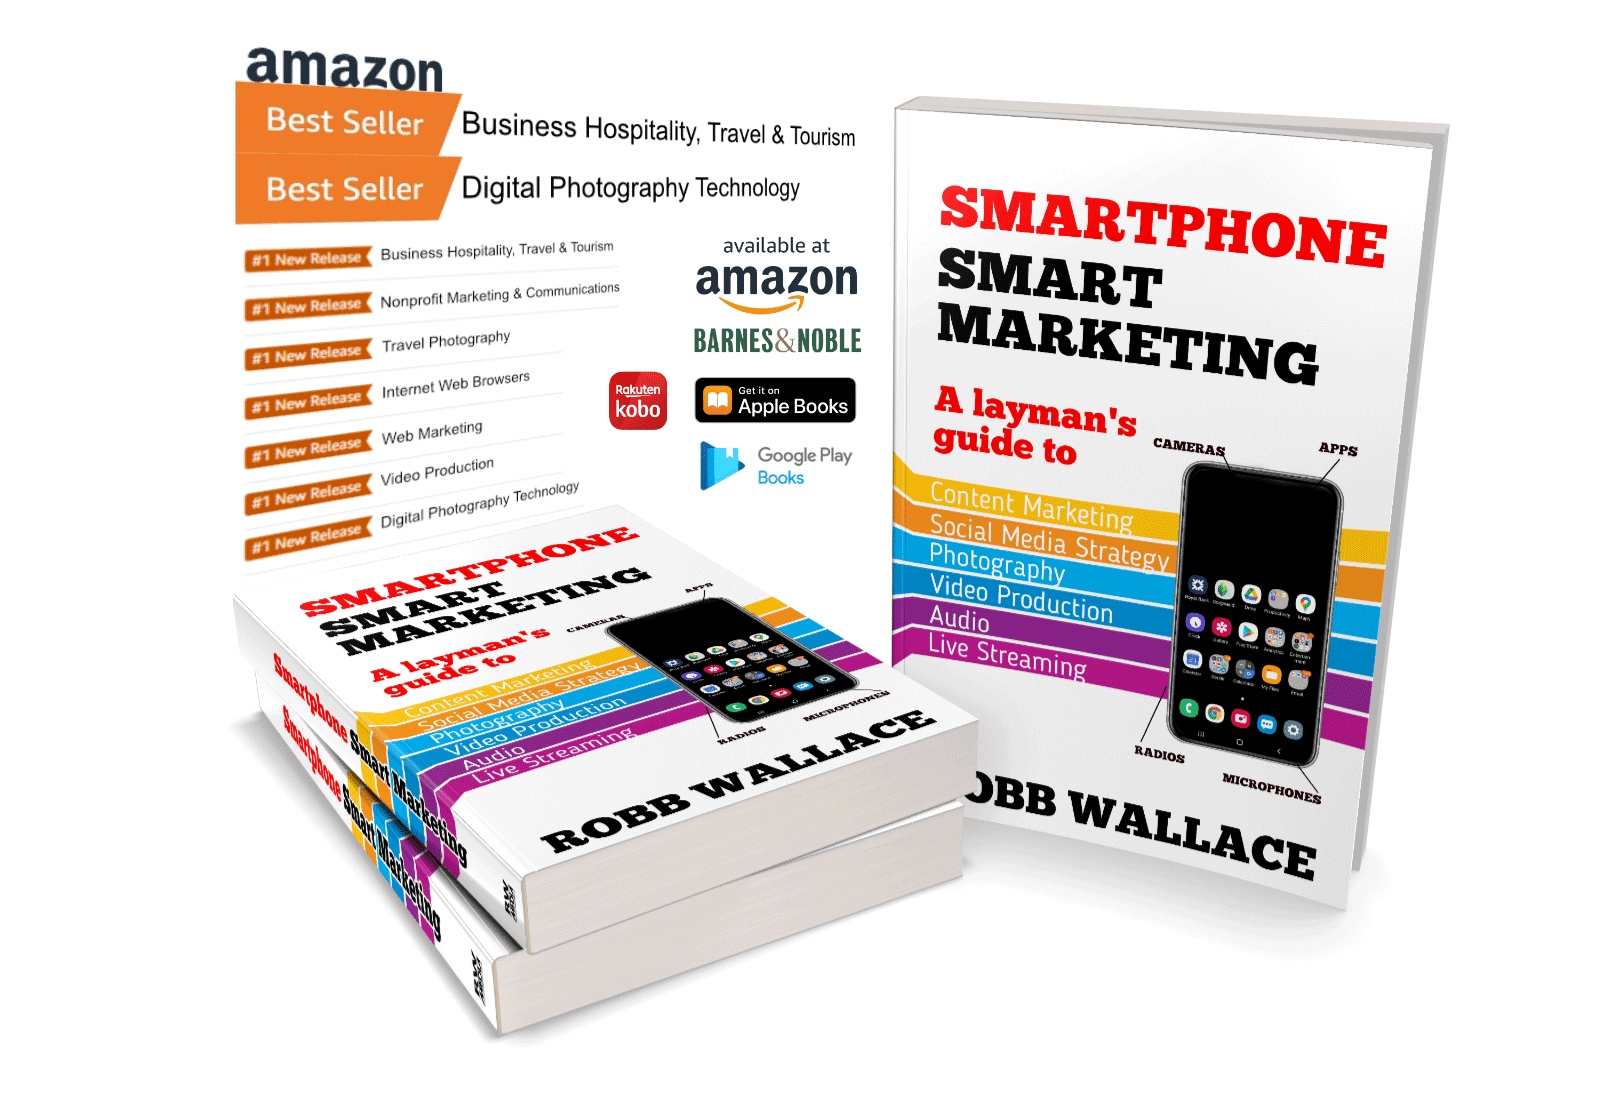 Smartphone-smart-marketing-best-seller-amazon-web2a